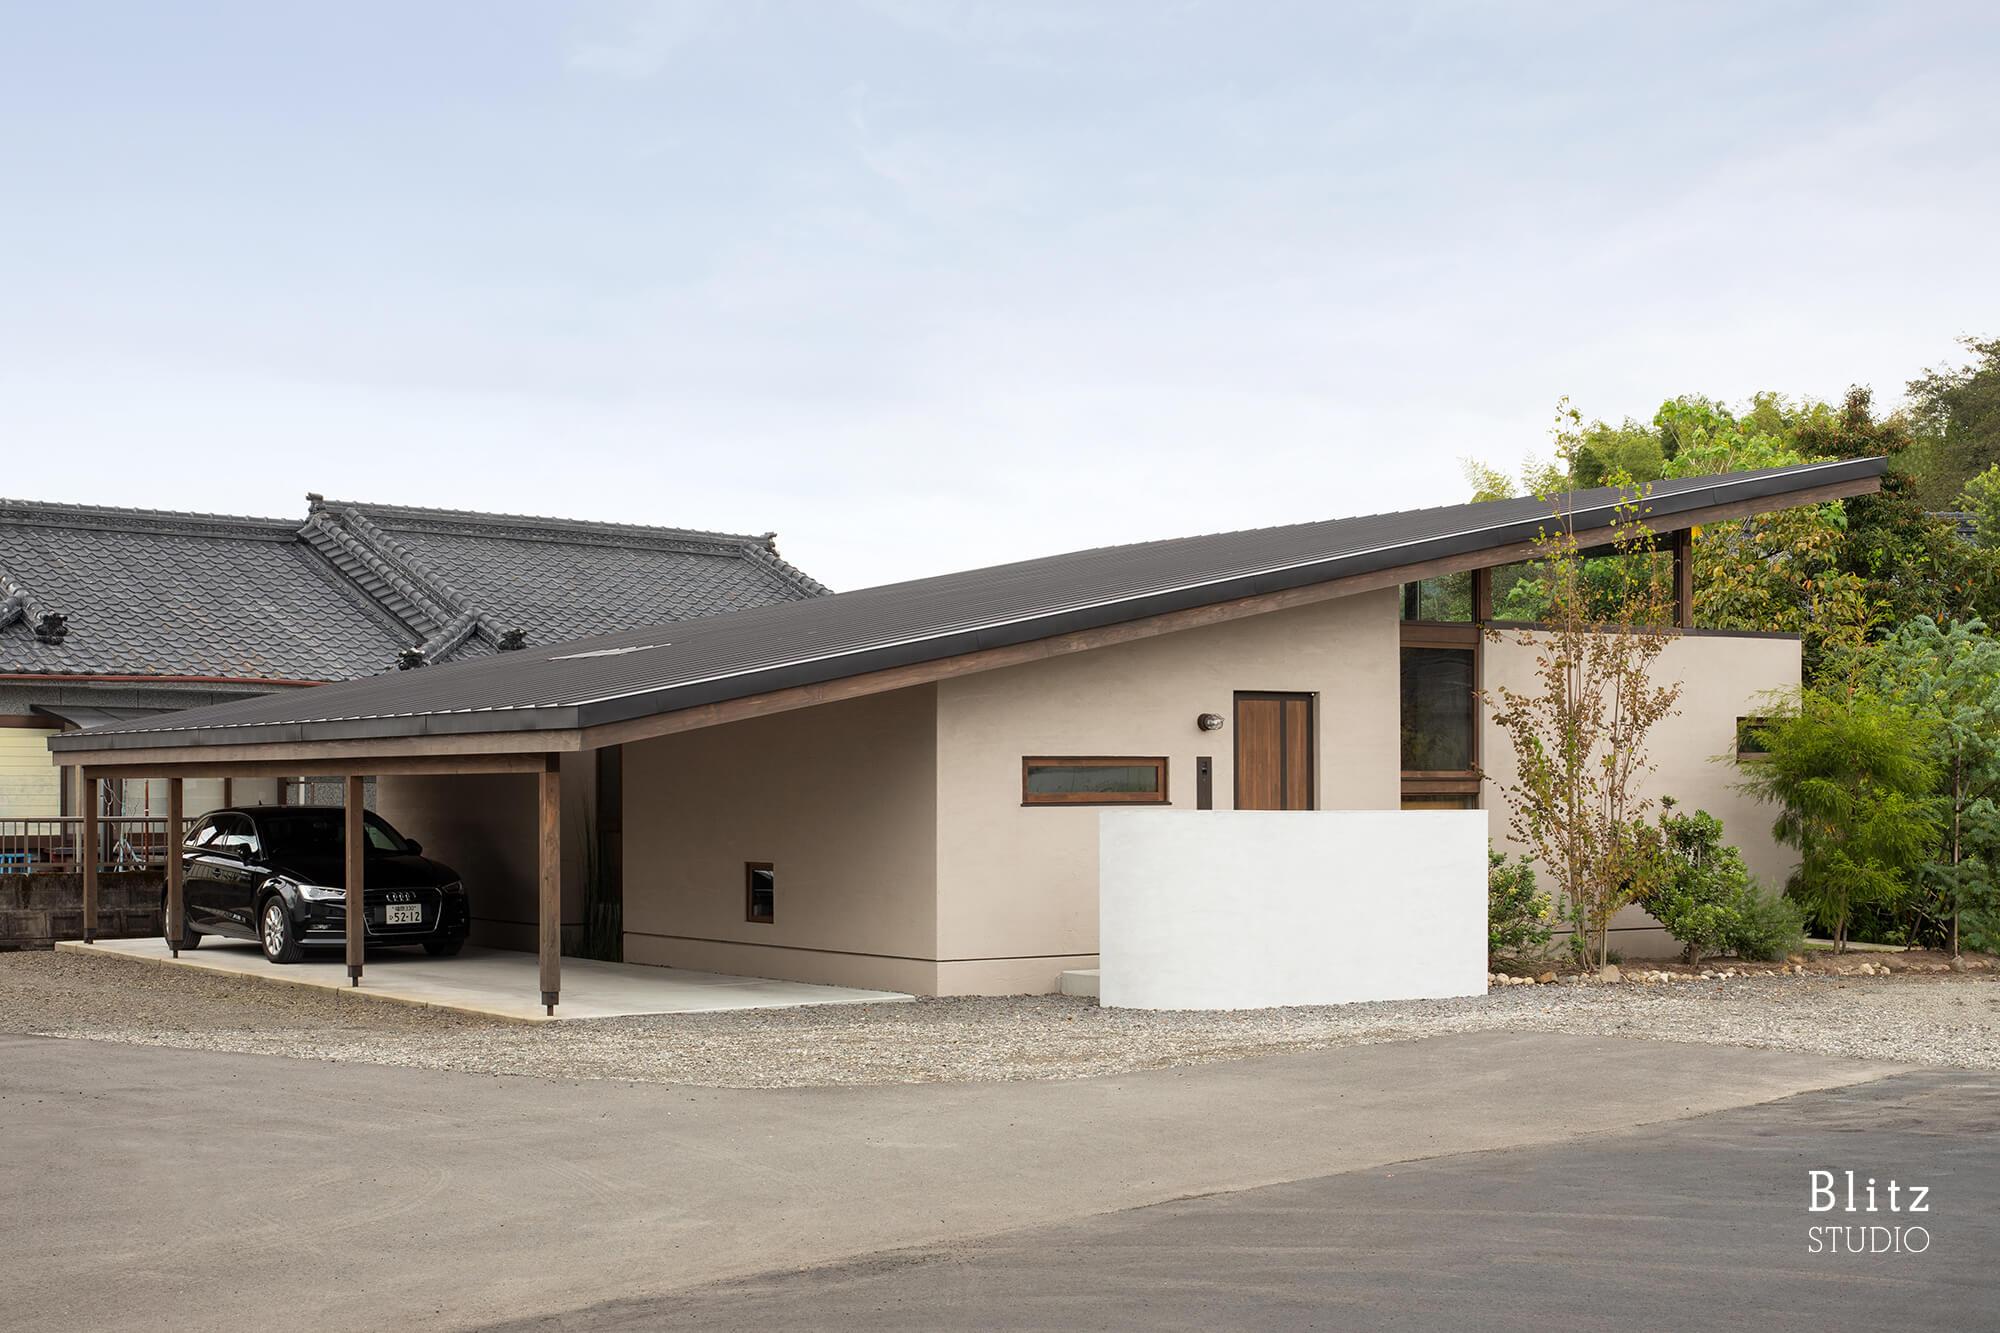 『姶良の家』-鹿児島県姶良市-建築写真・竣工写真・インテリア写真1